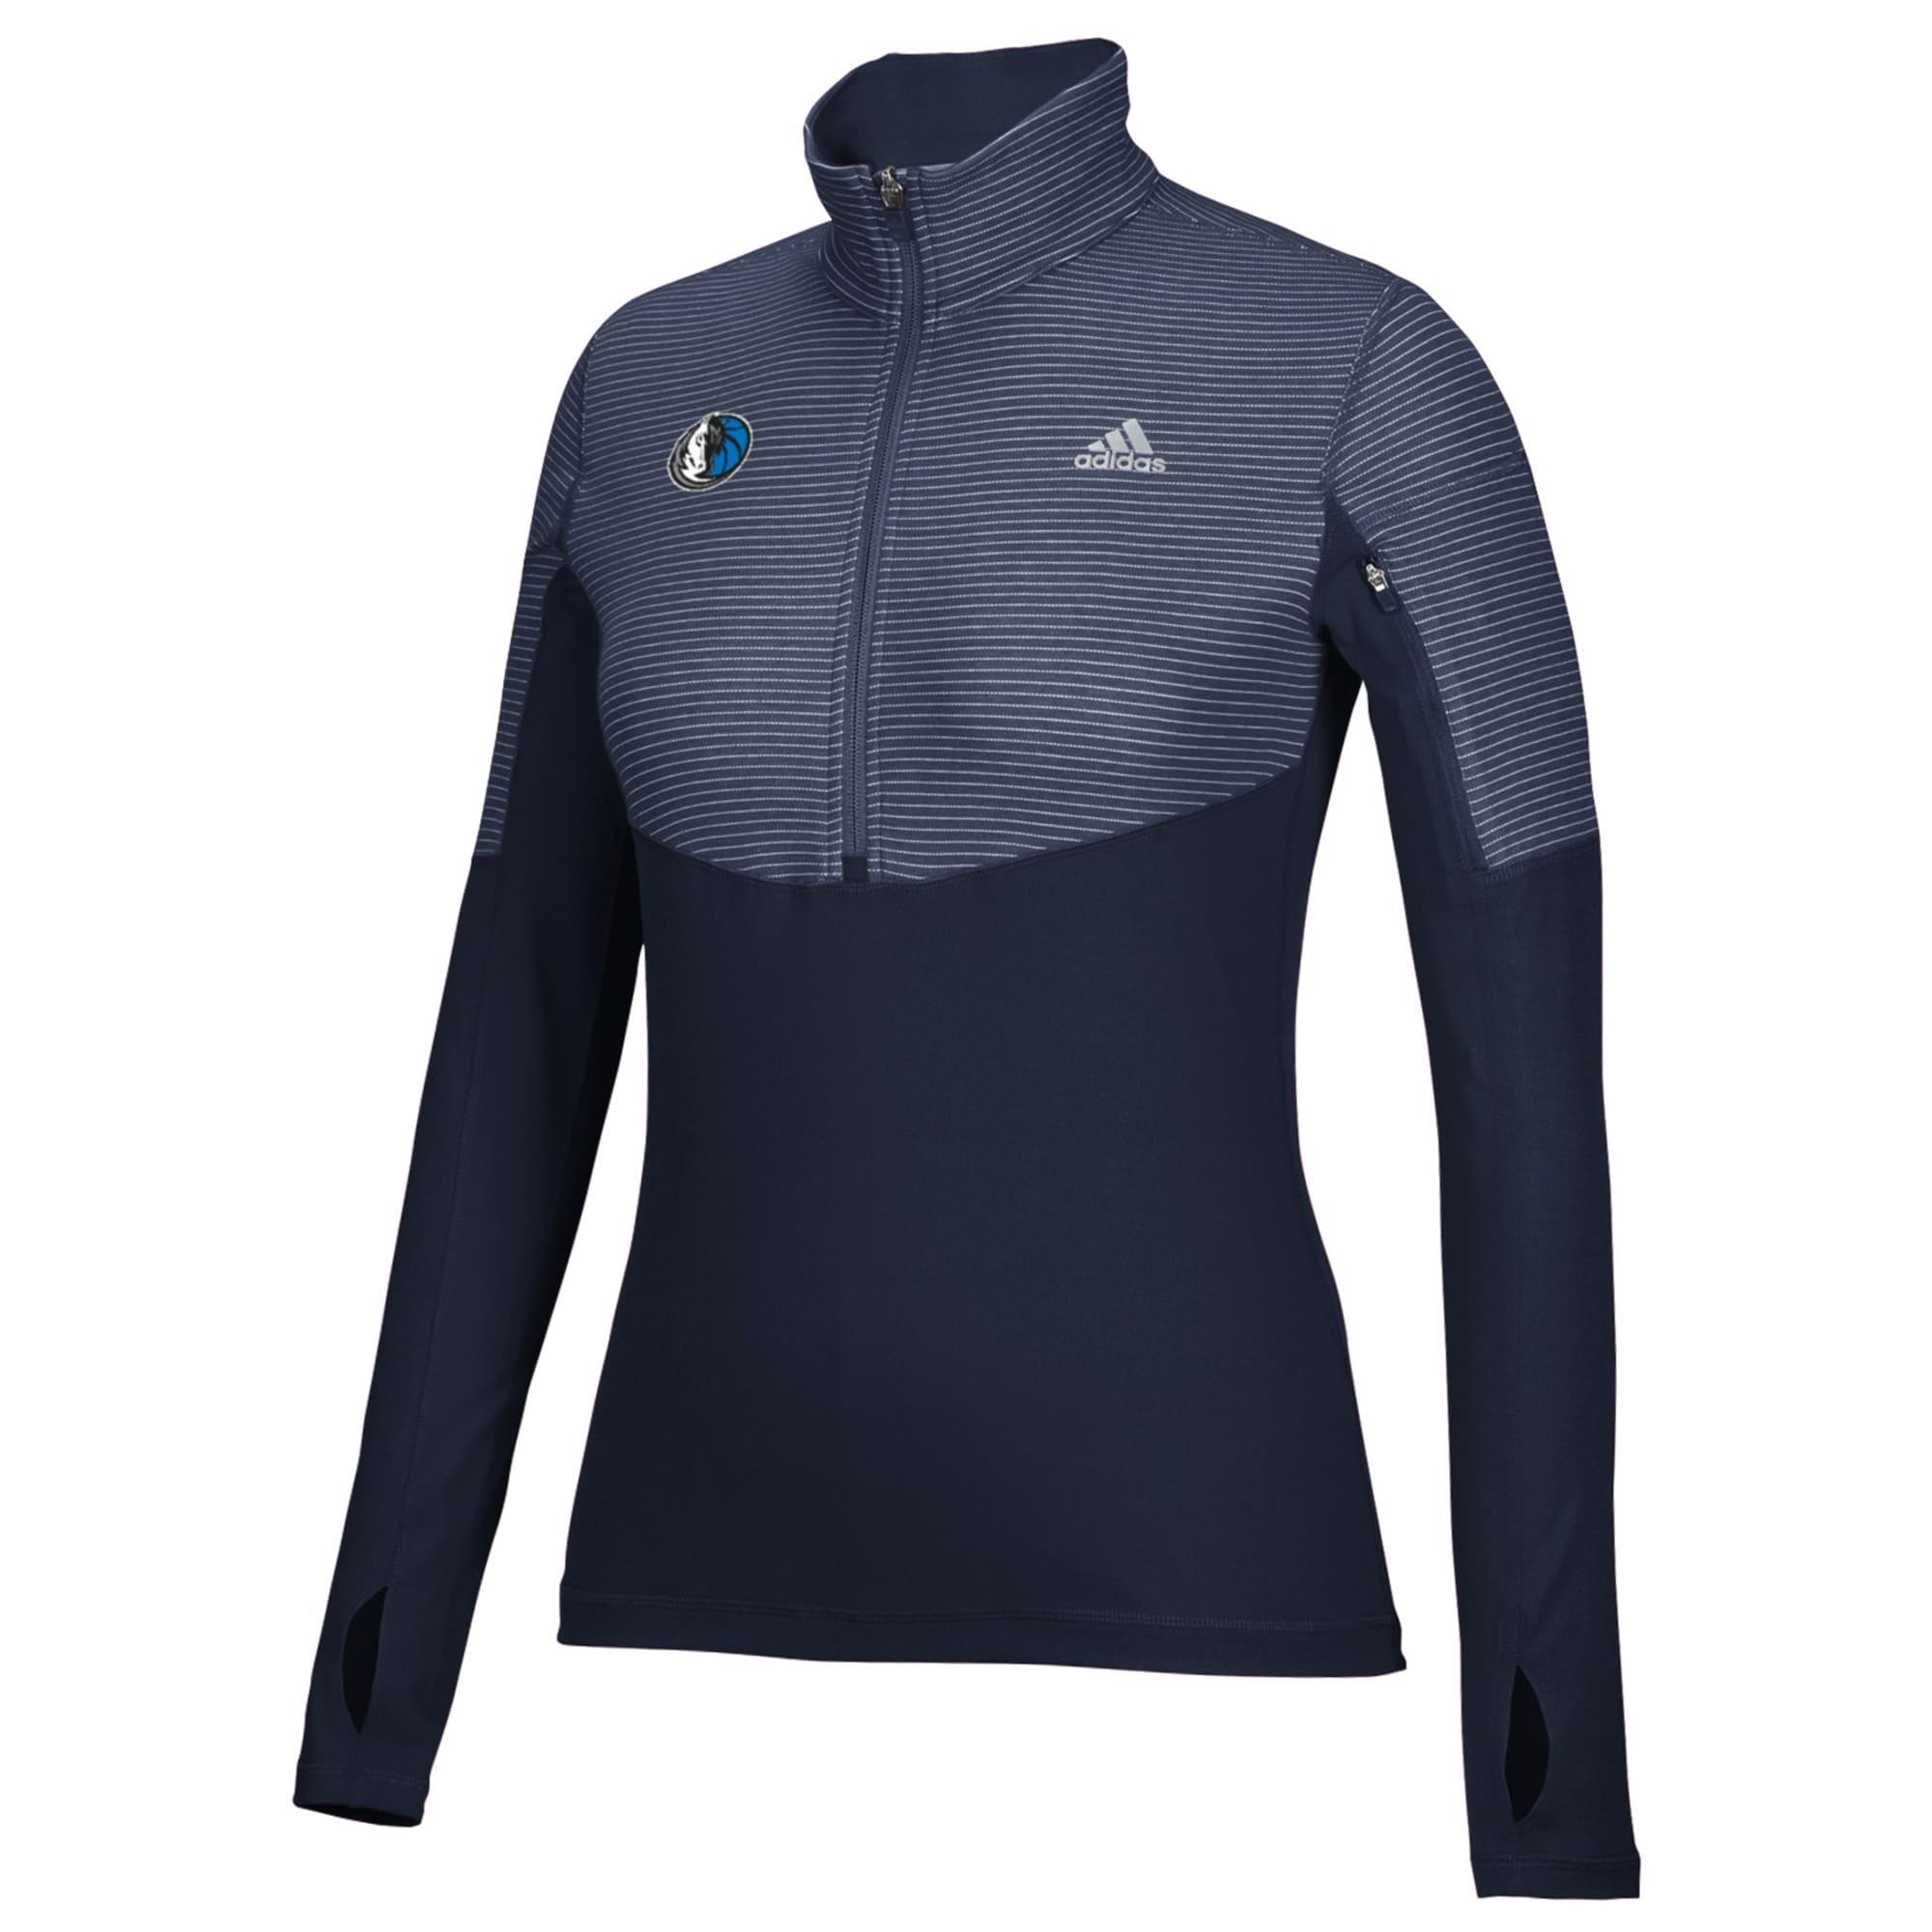 Dallas Mavericks adidas Women's Team Logo Lightweight Performance Half-Zip Jacket - Navy